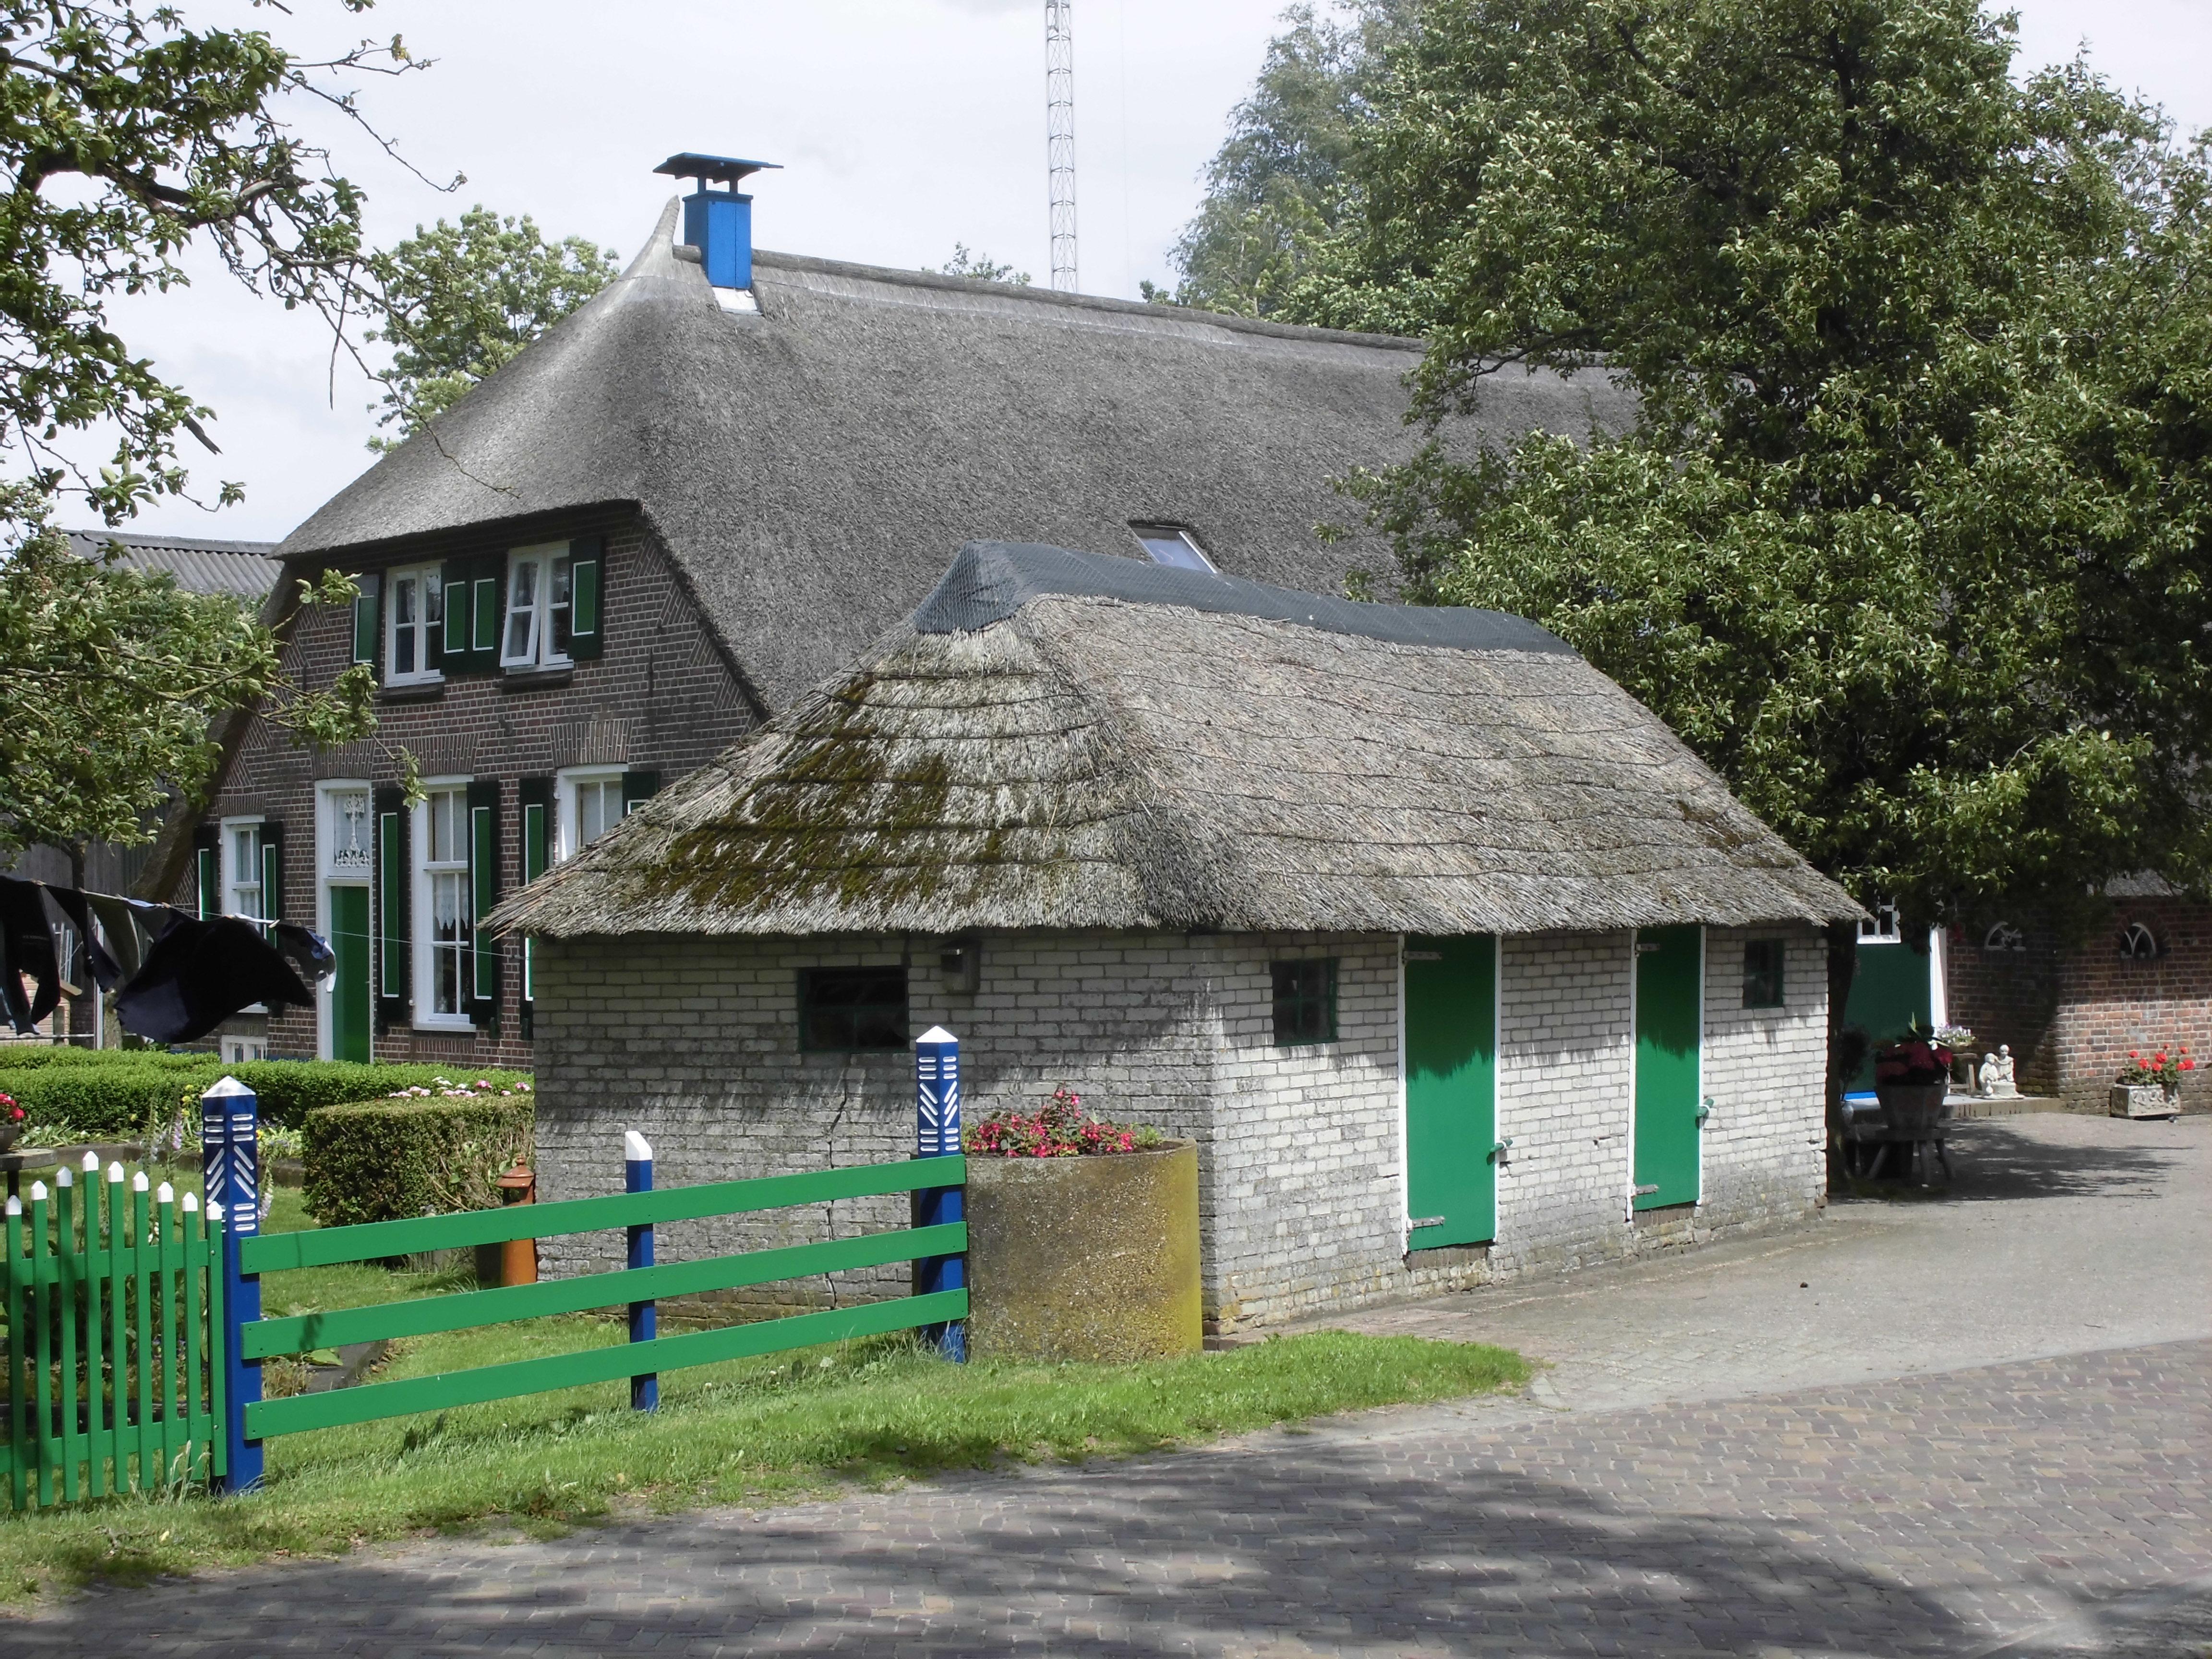 Gave boerderij van het staphorstse type interieur met for Boerderij interieur